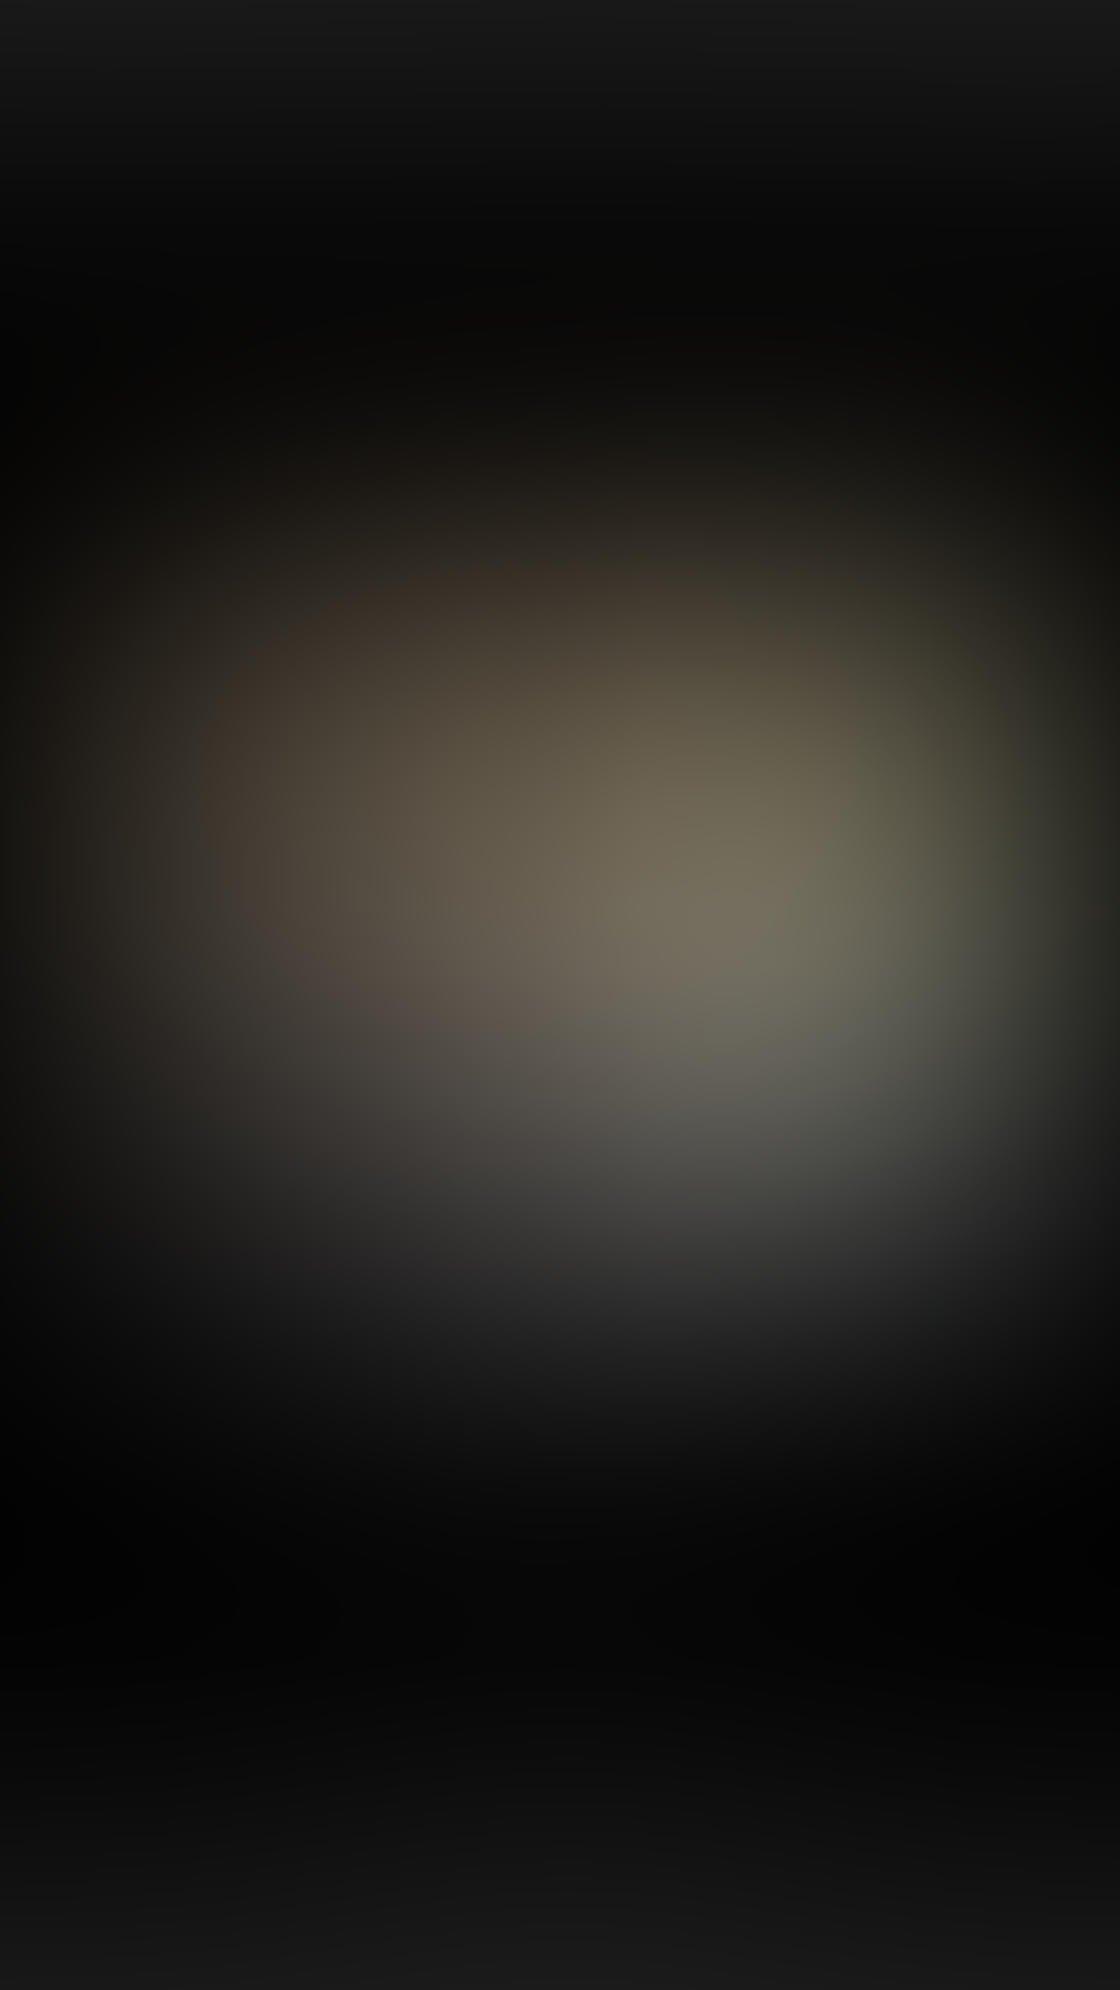 Lenslight iPhone Photo App 20